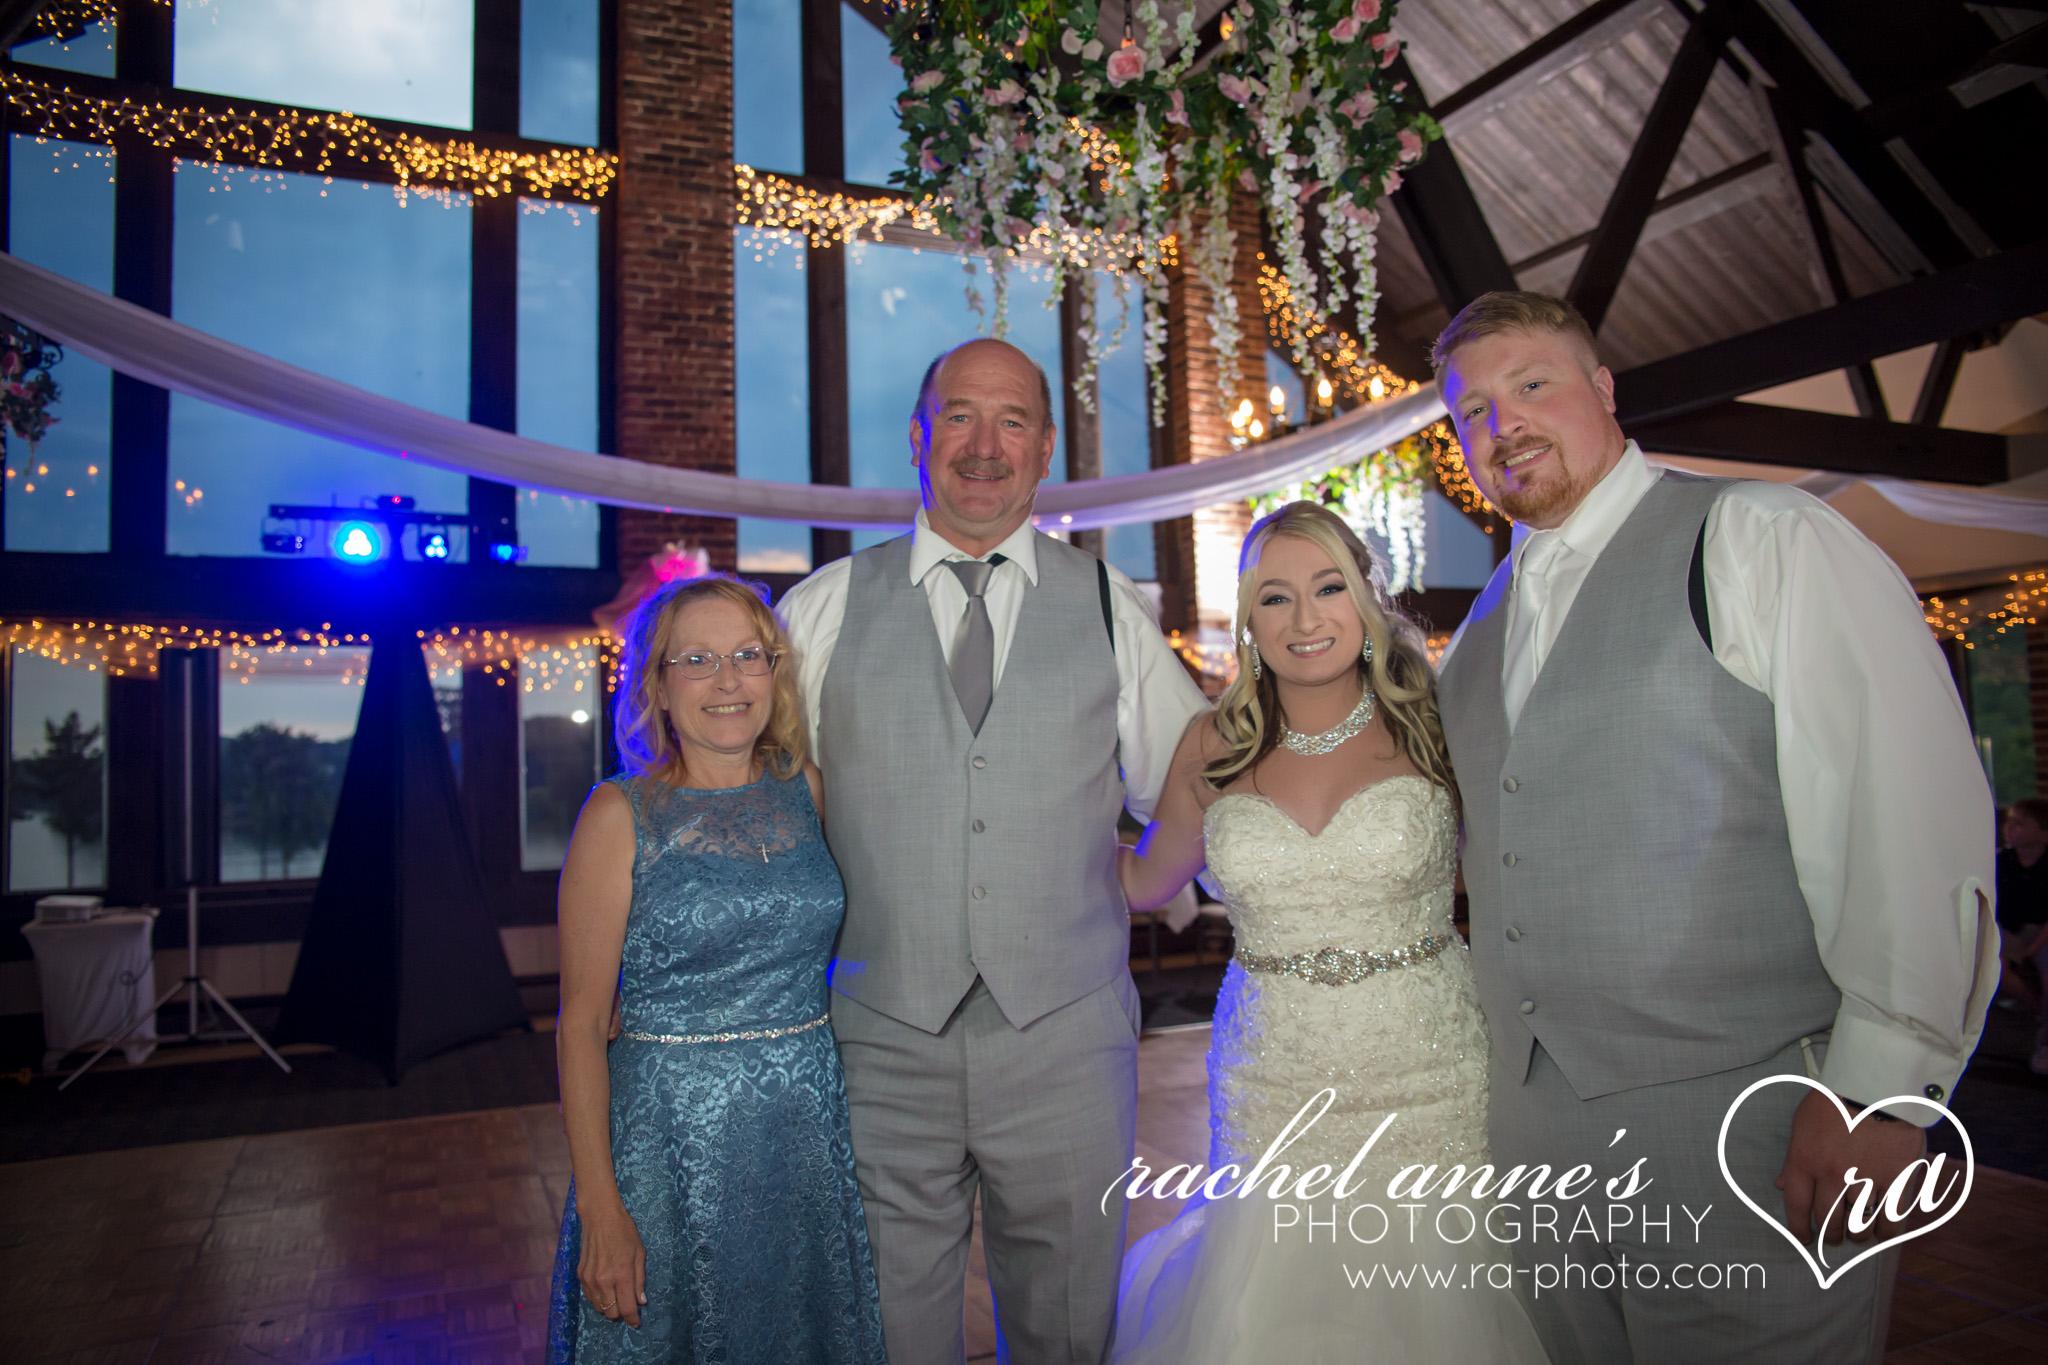 077-CMQ-TREASURE-LAKEVIEW-LODGE-DUBOIS-WEDDINGS.jpg